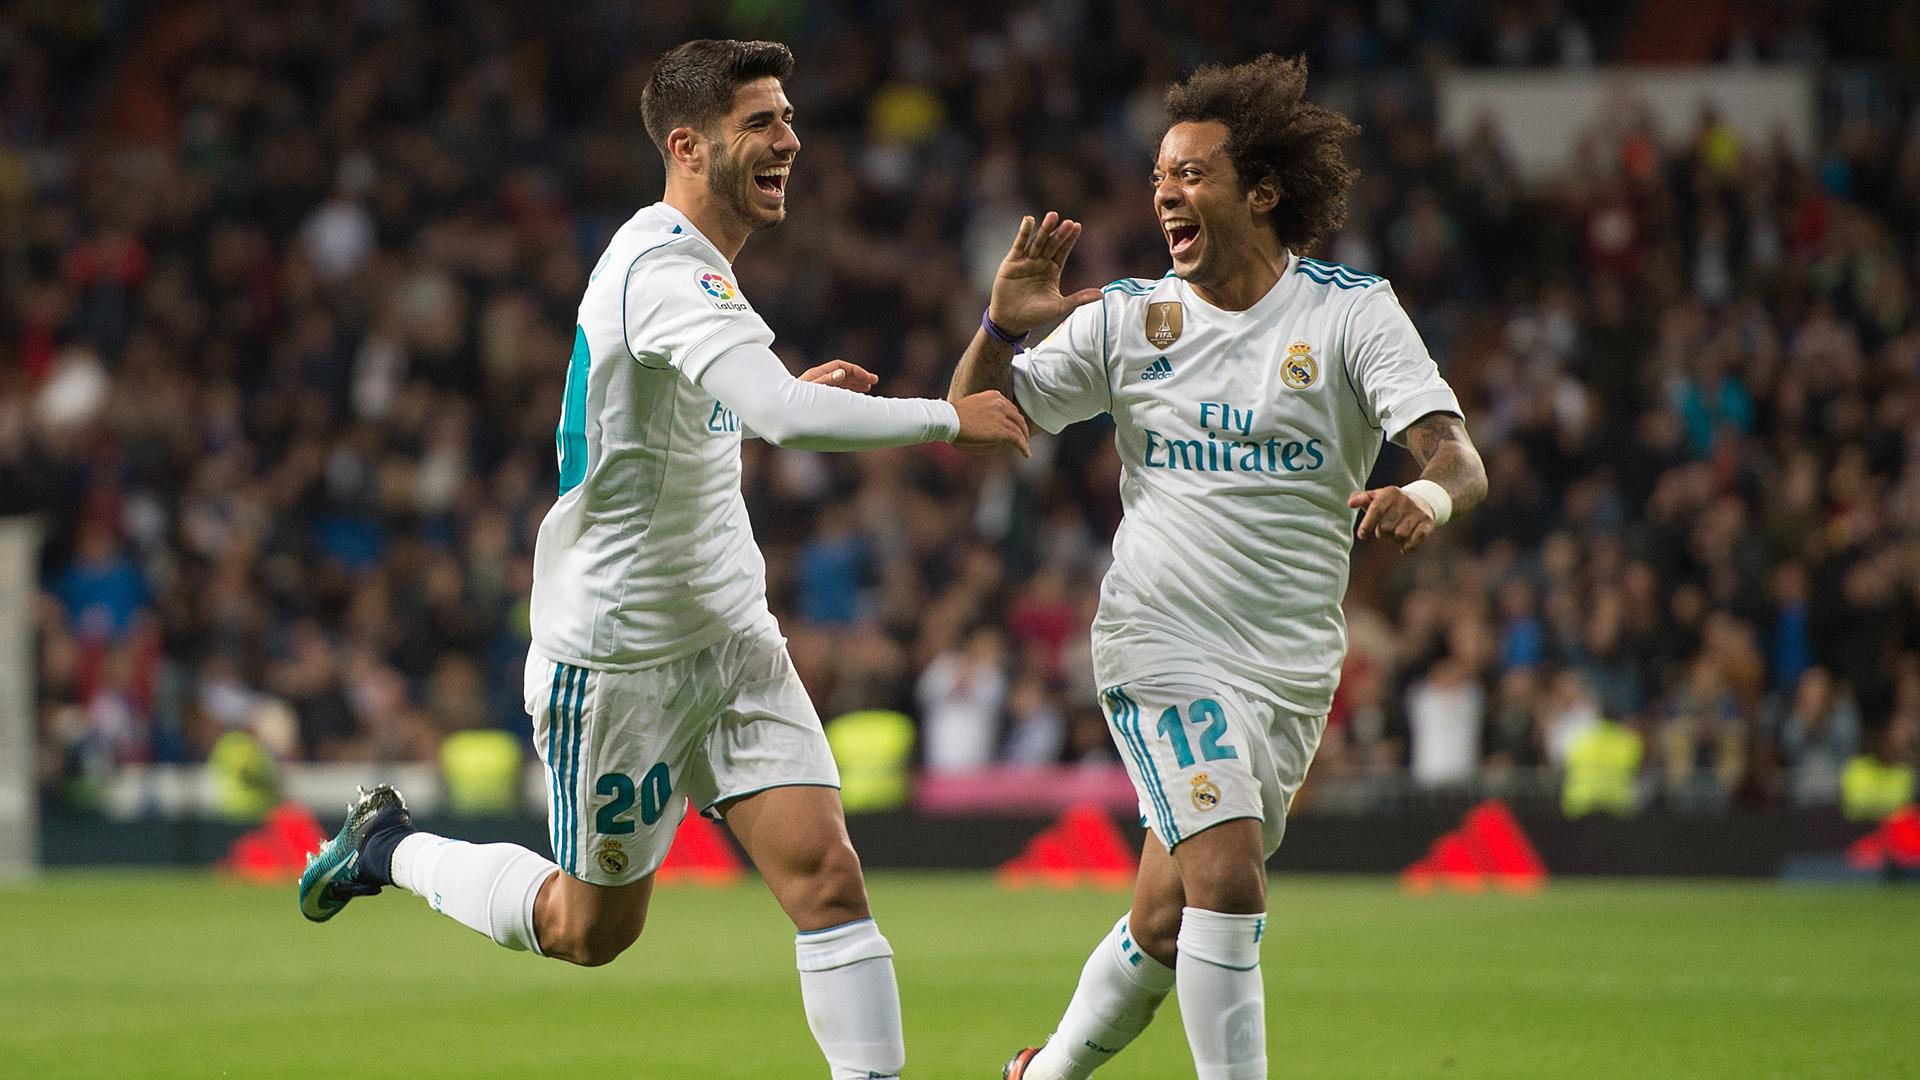 Real Madrid Las Palmas Asensio Marcelo 05112017